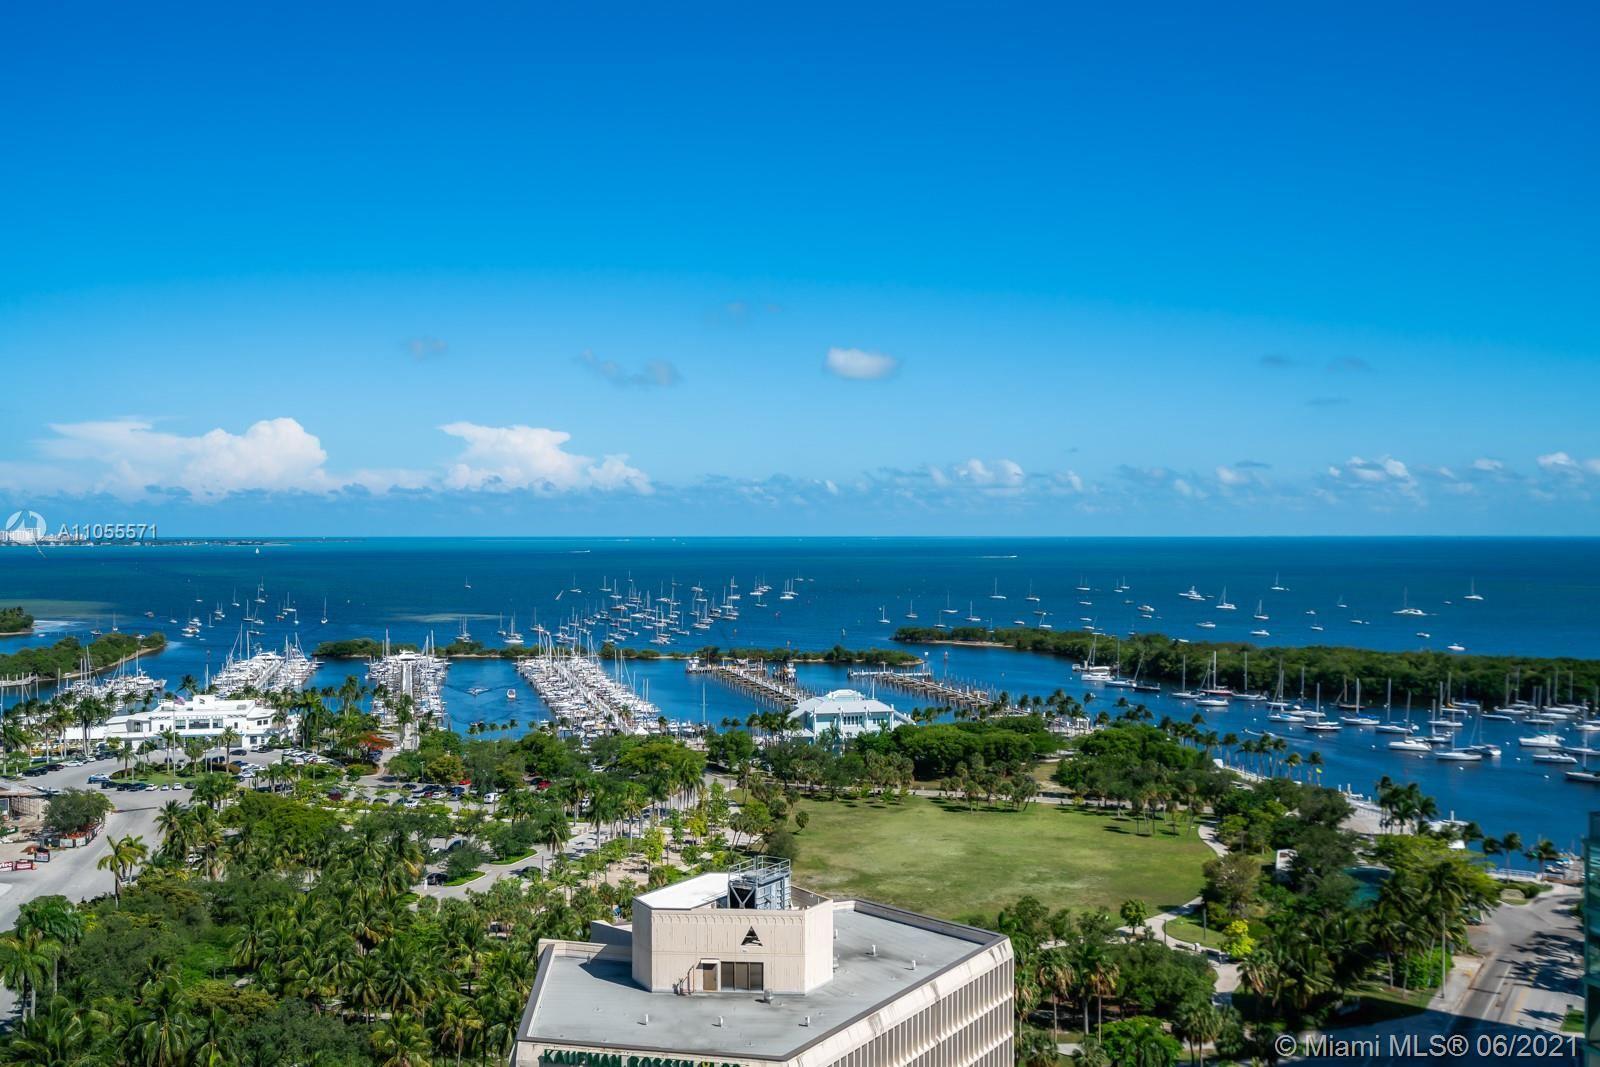 Photo of 3350 SW 27th Ave #2101, Miami, FL 33133 (MLS # A11055571)